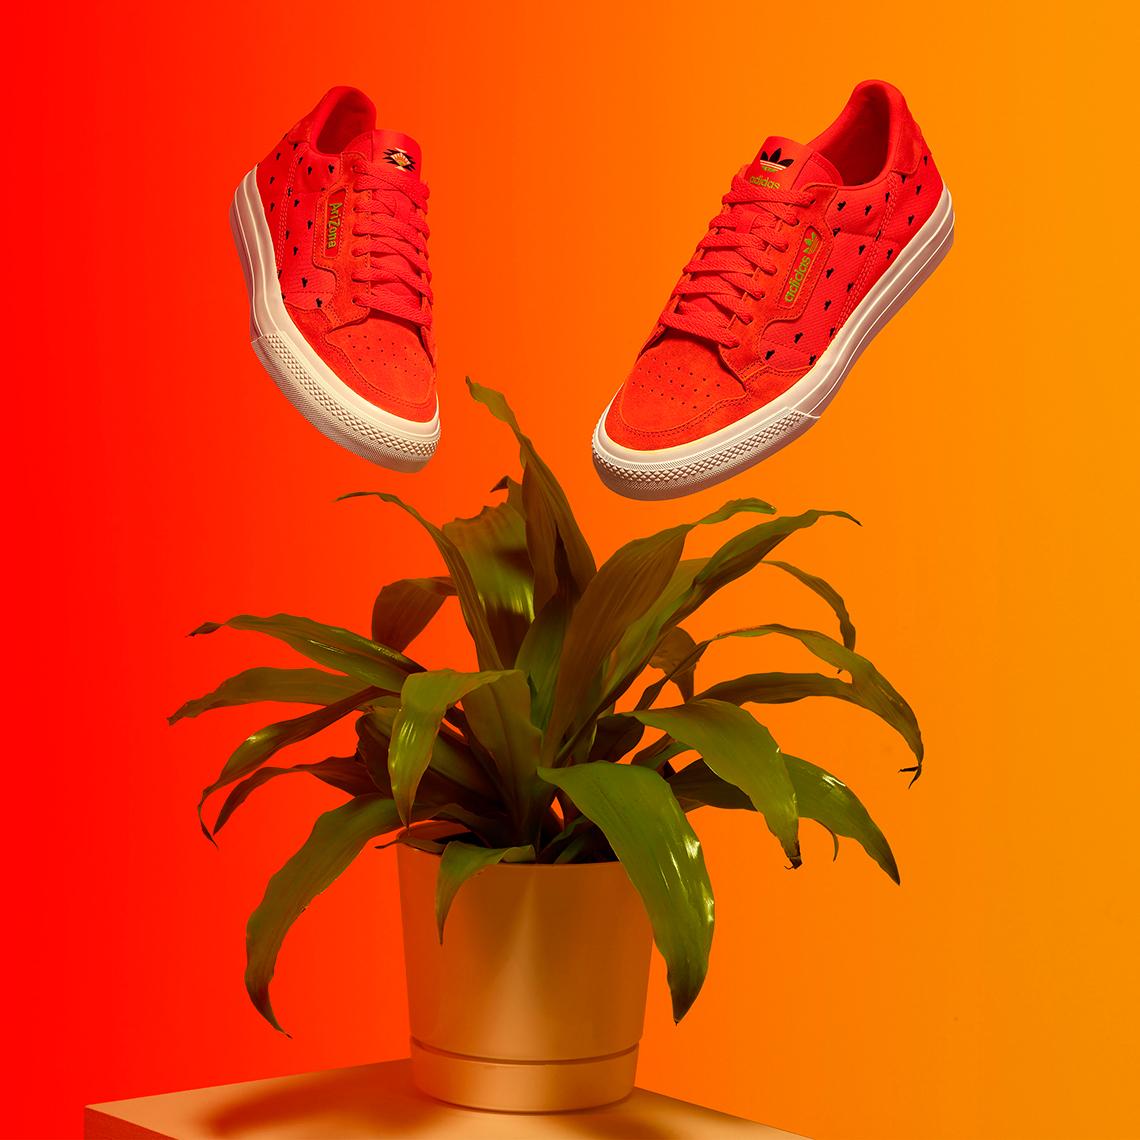 Adidas-AriZona-05